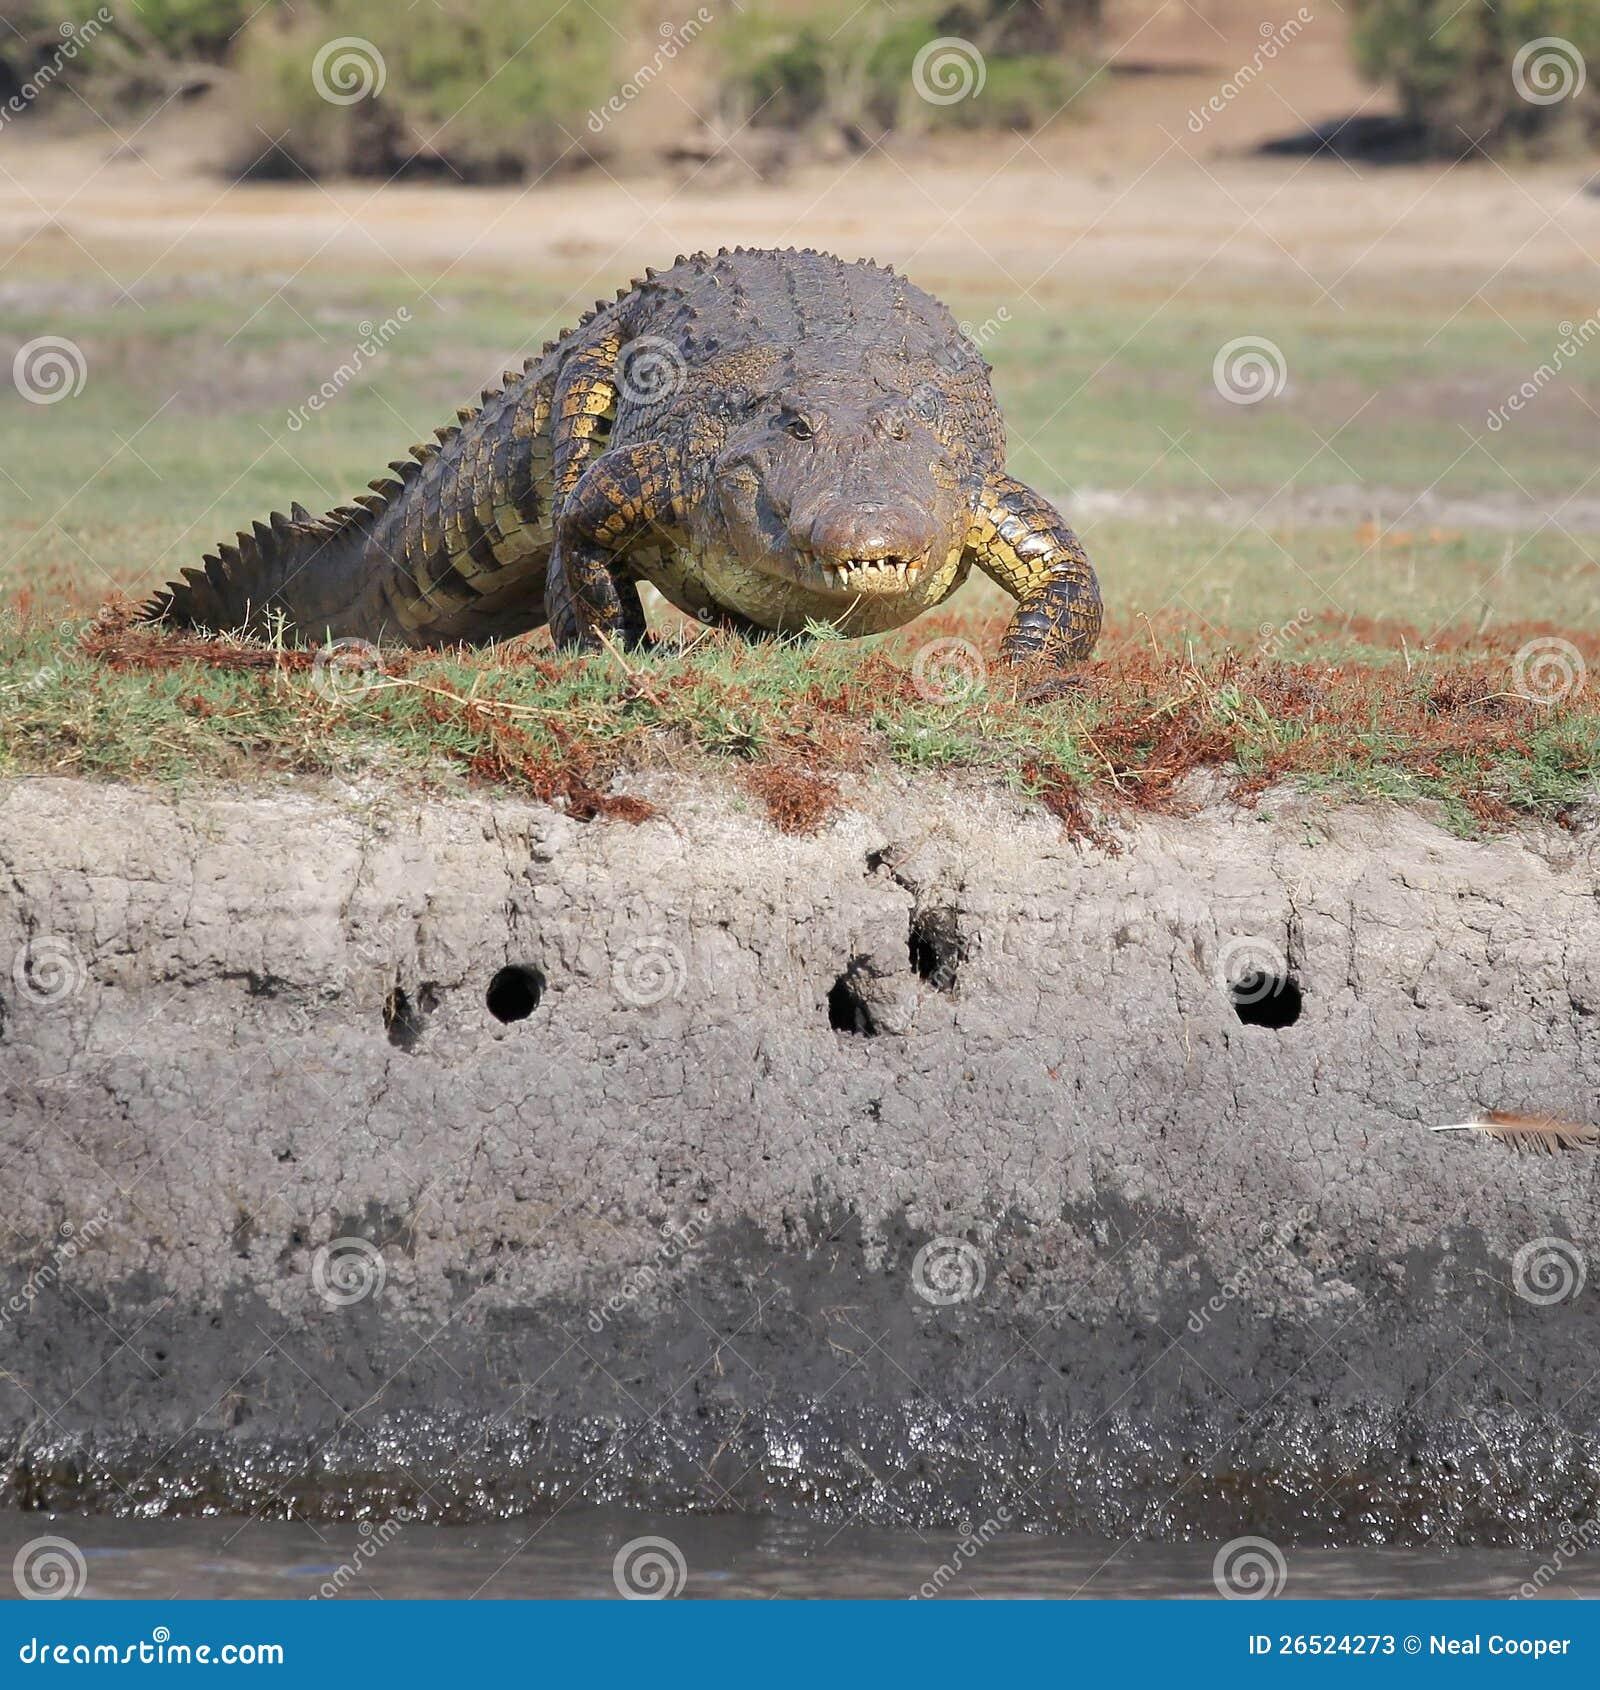 Nile Crocodile Lying On River Bank Stock Image